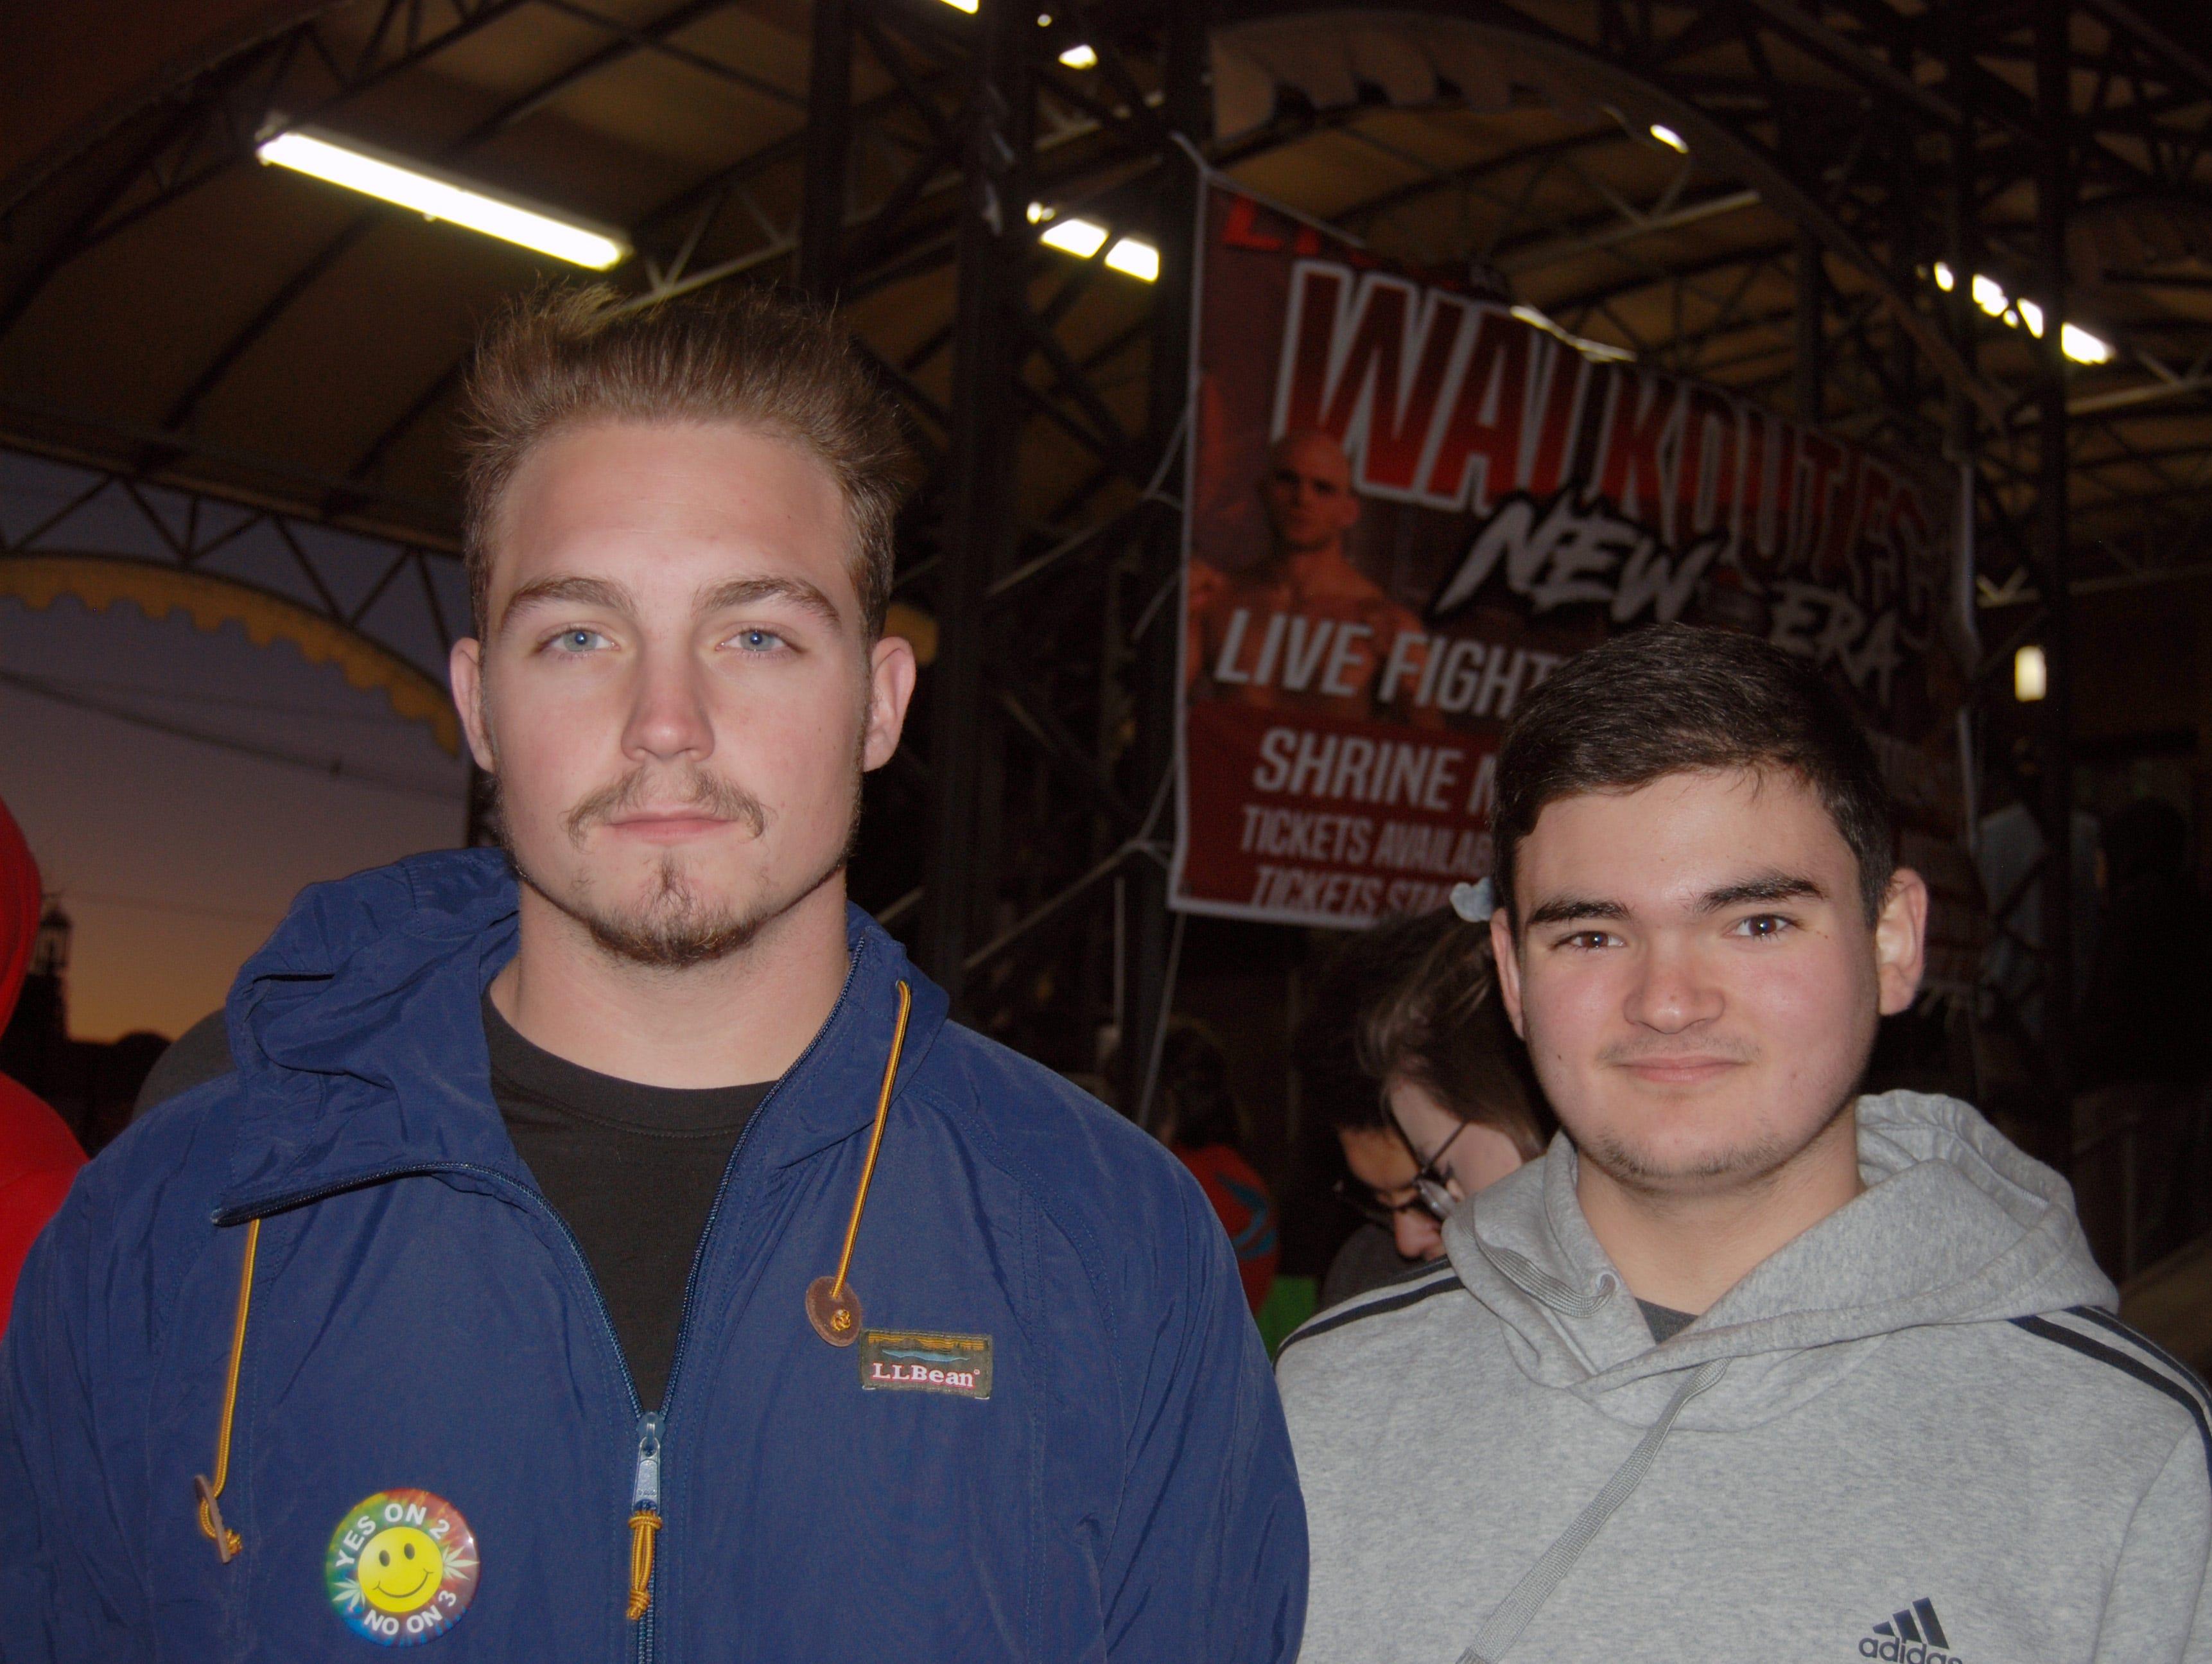 Austin Walters and Trevor Biondi